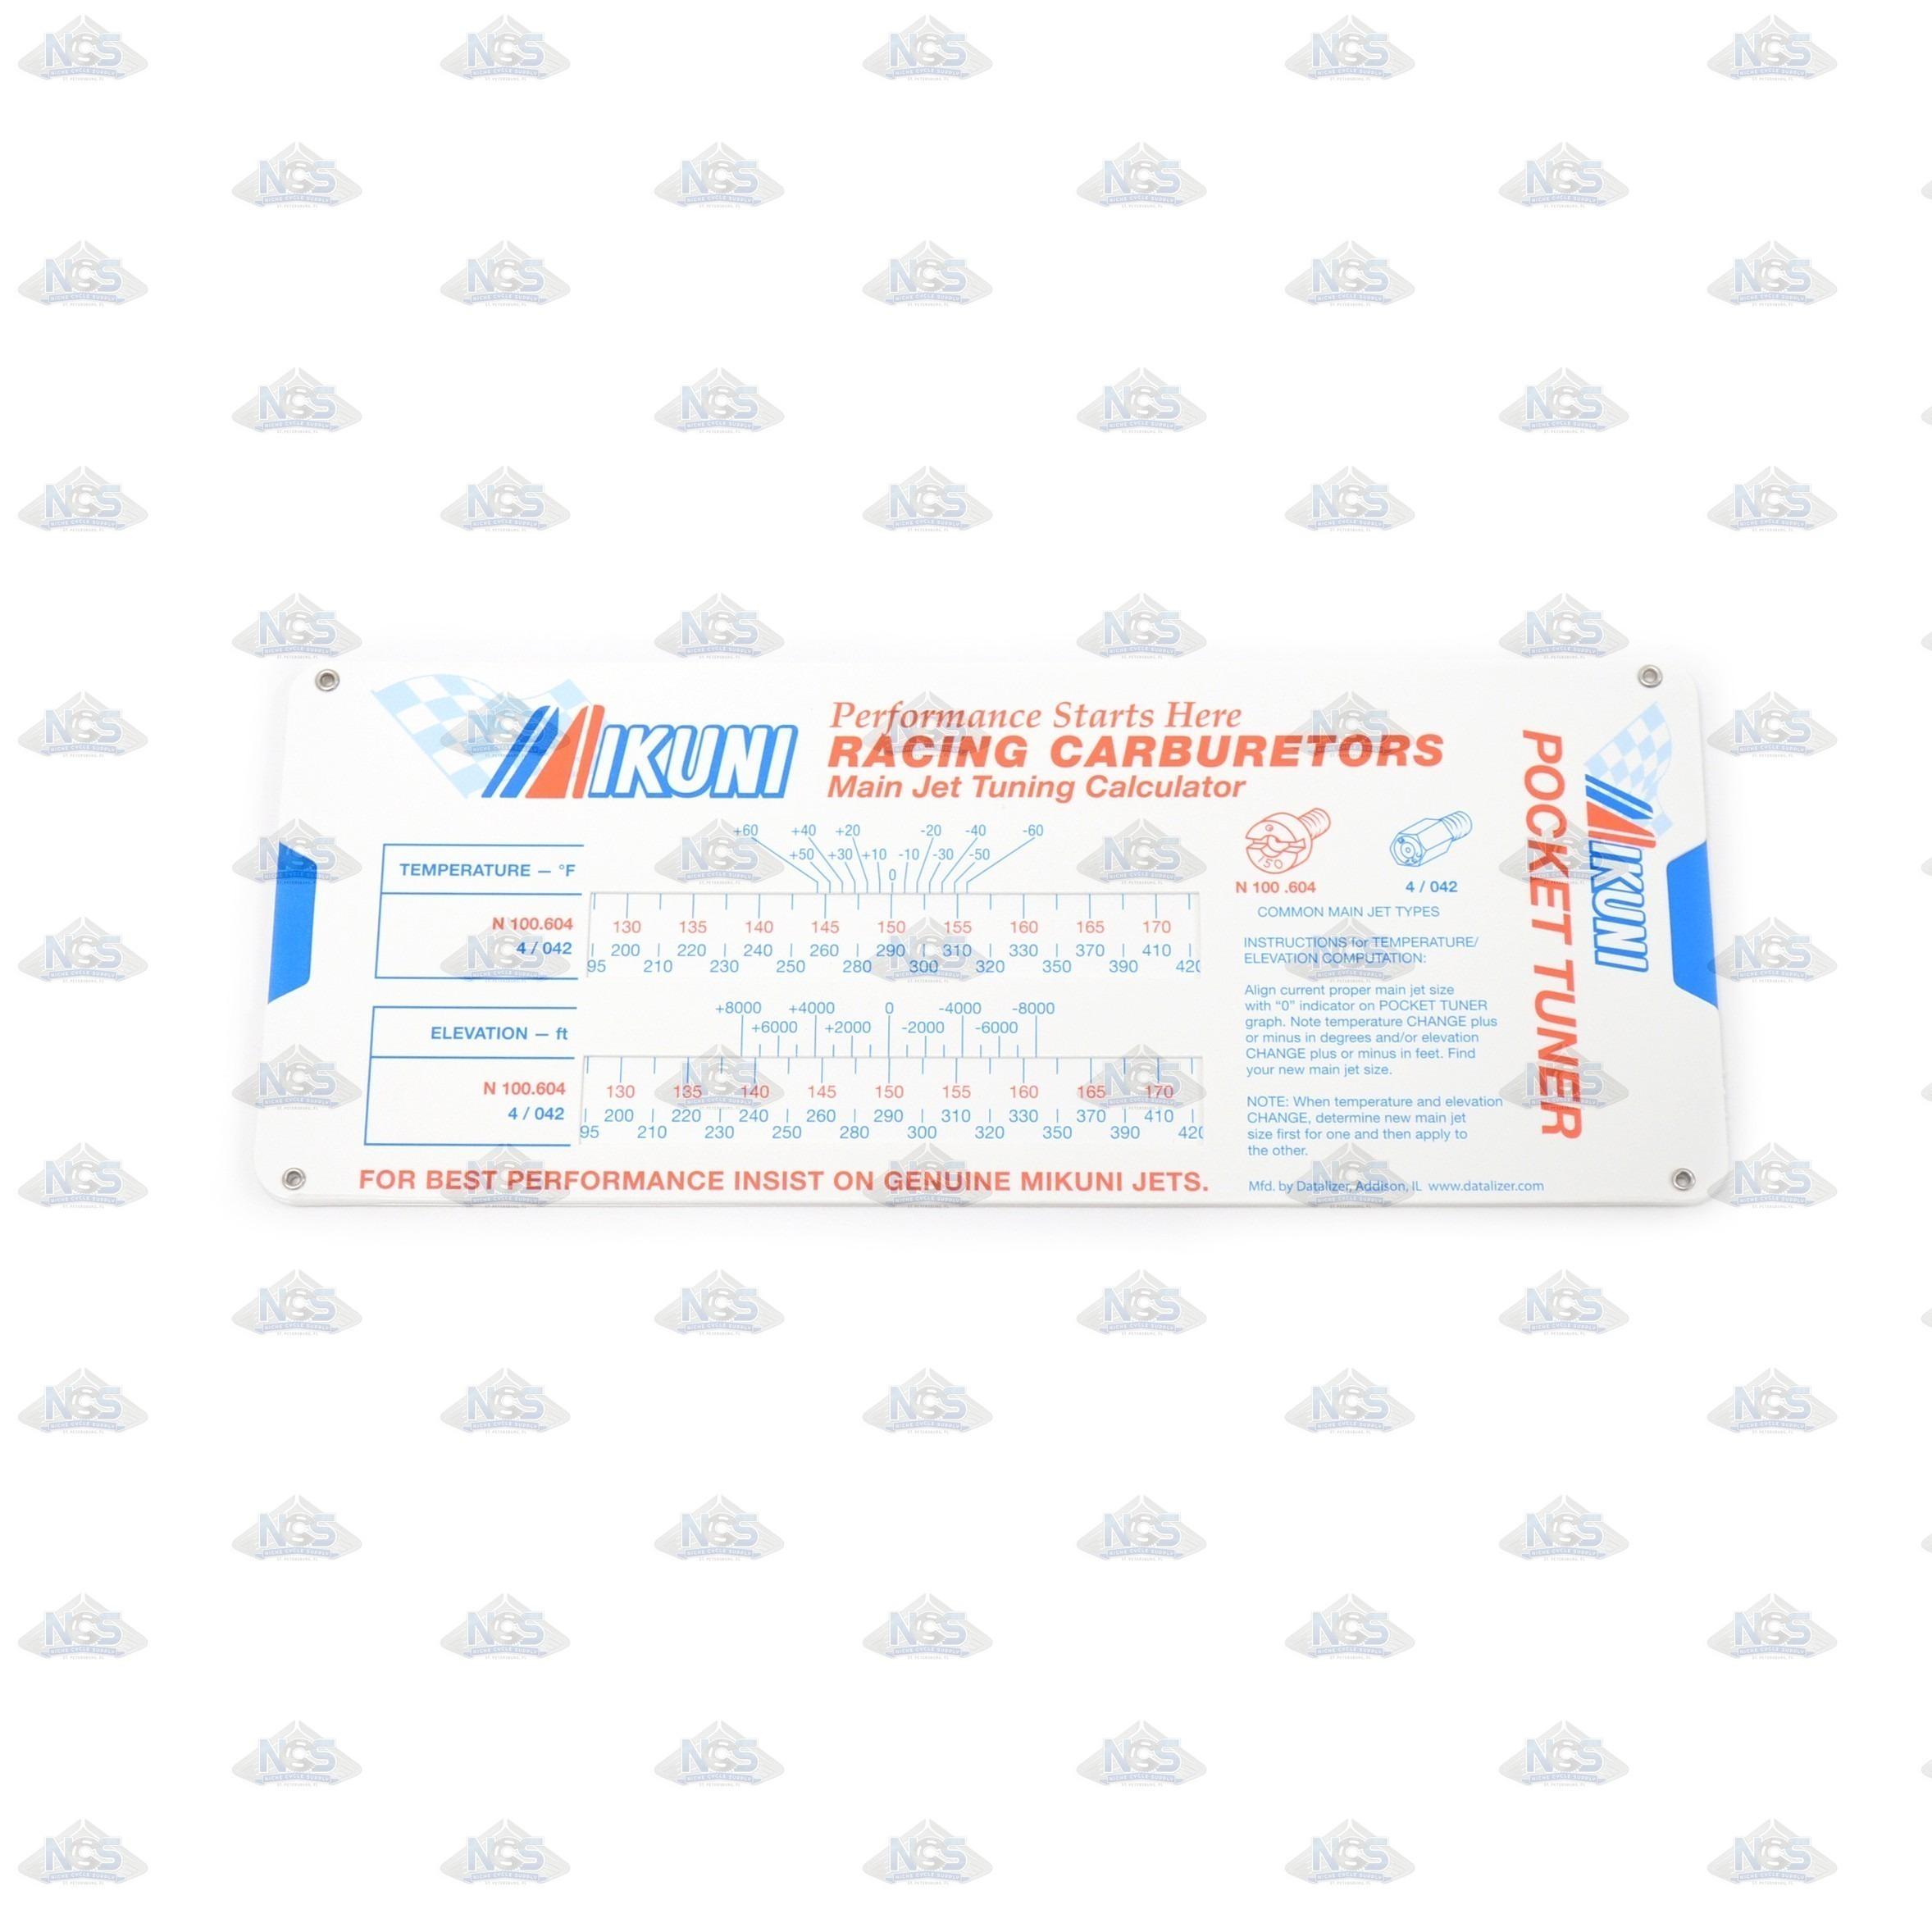 Mikuni Pocket Tuner Temperature Elevation - Find your elevation